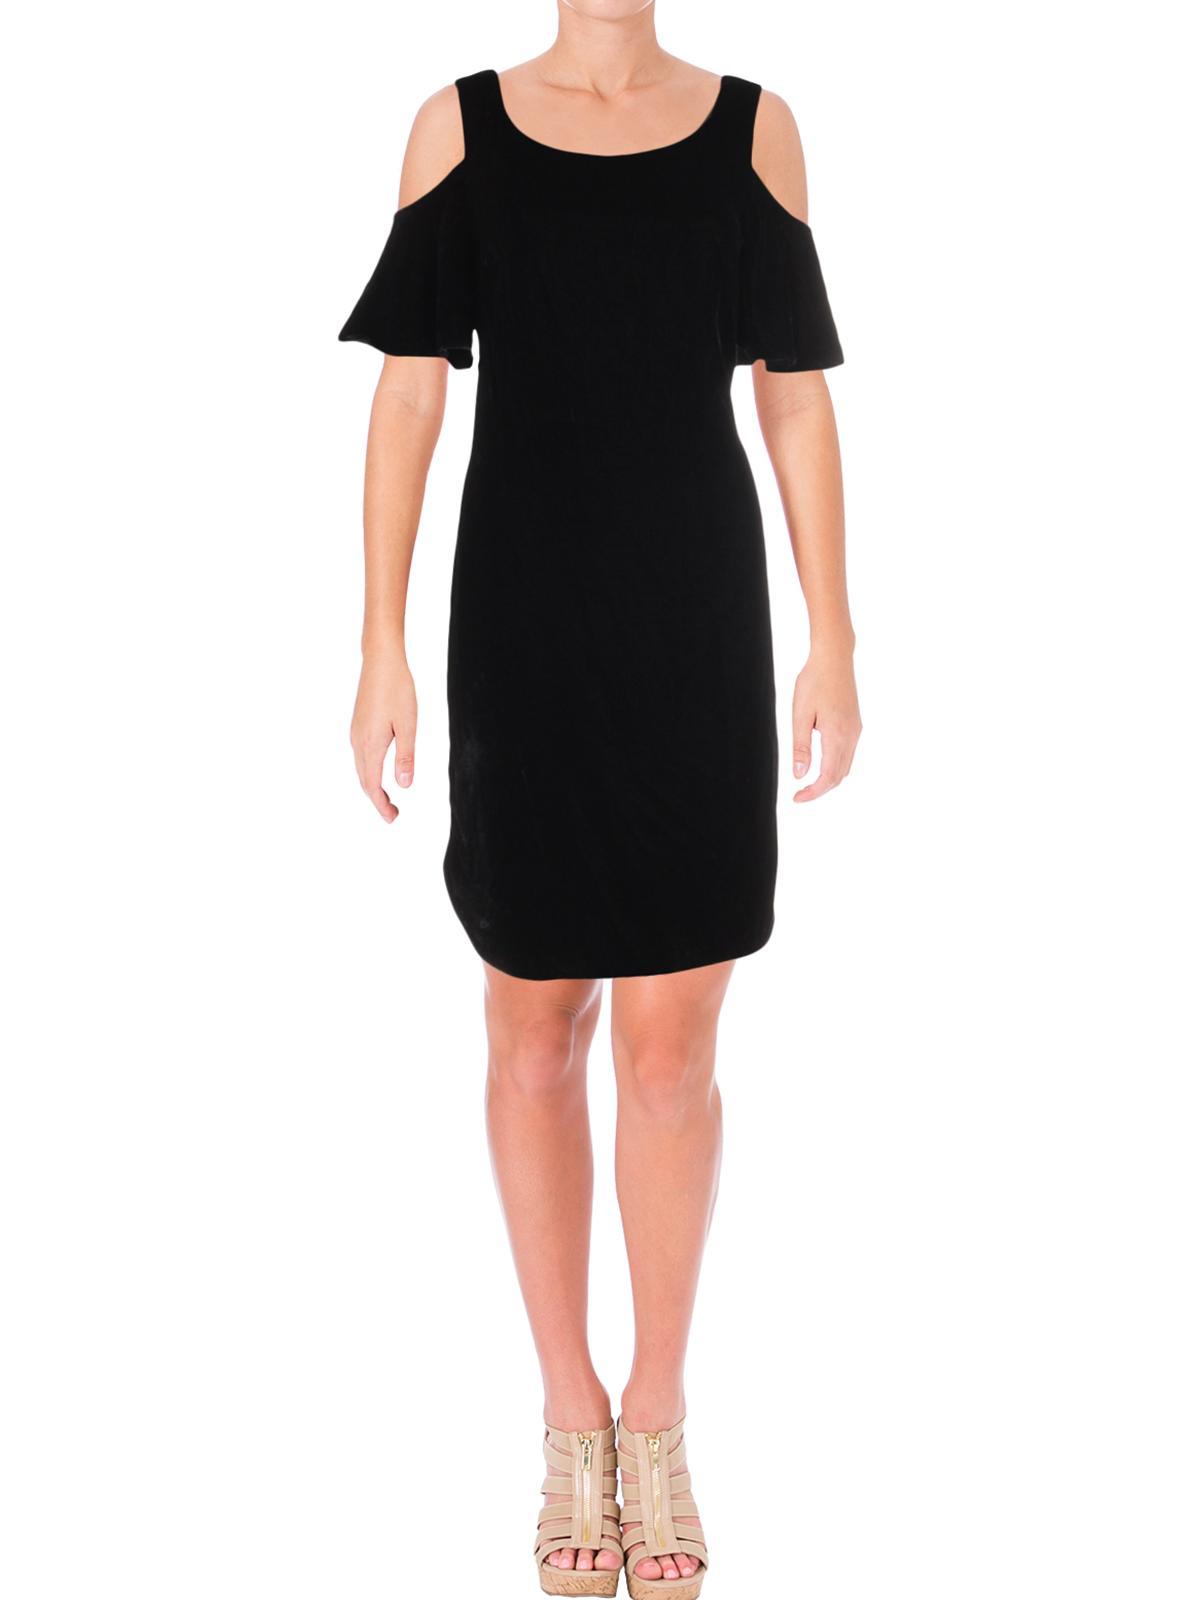 RALPH LAUREN Womens Black Cold Shoulder Ruffled Short Sleeve Scoop Neck Above The Knee Shift Evening Dress  Size: 12